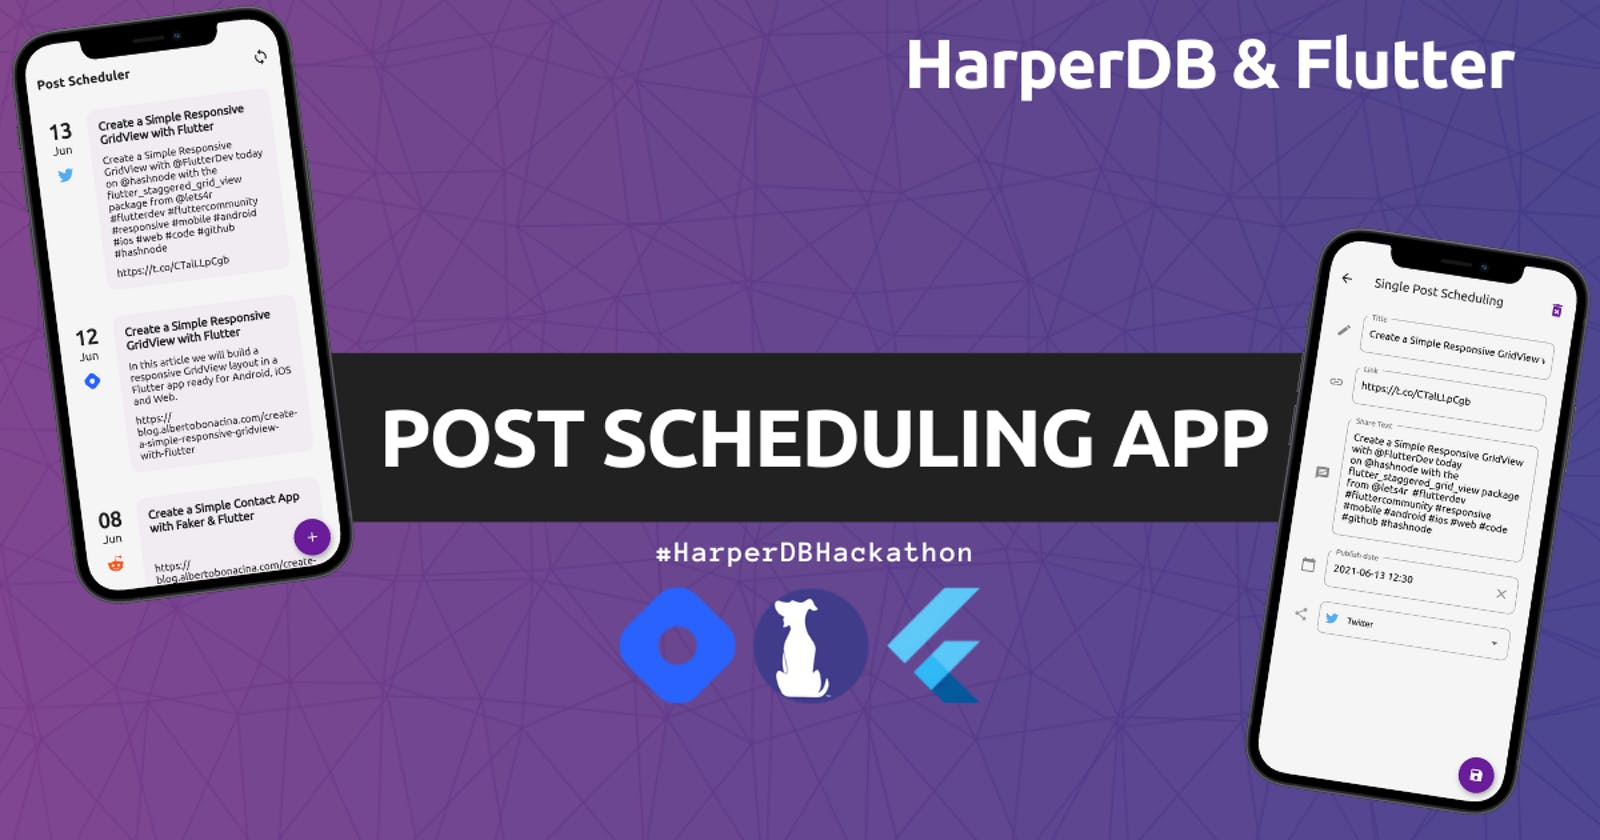 Building a Post Scheduling App with HarperDB & Flutter